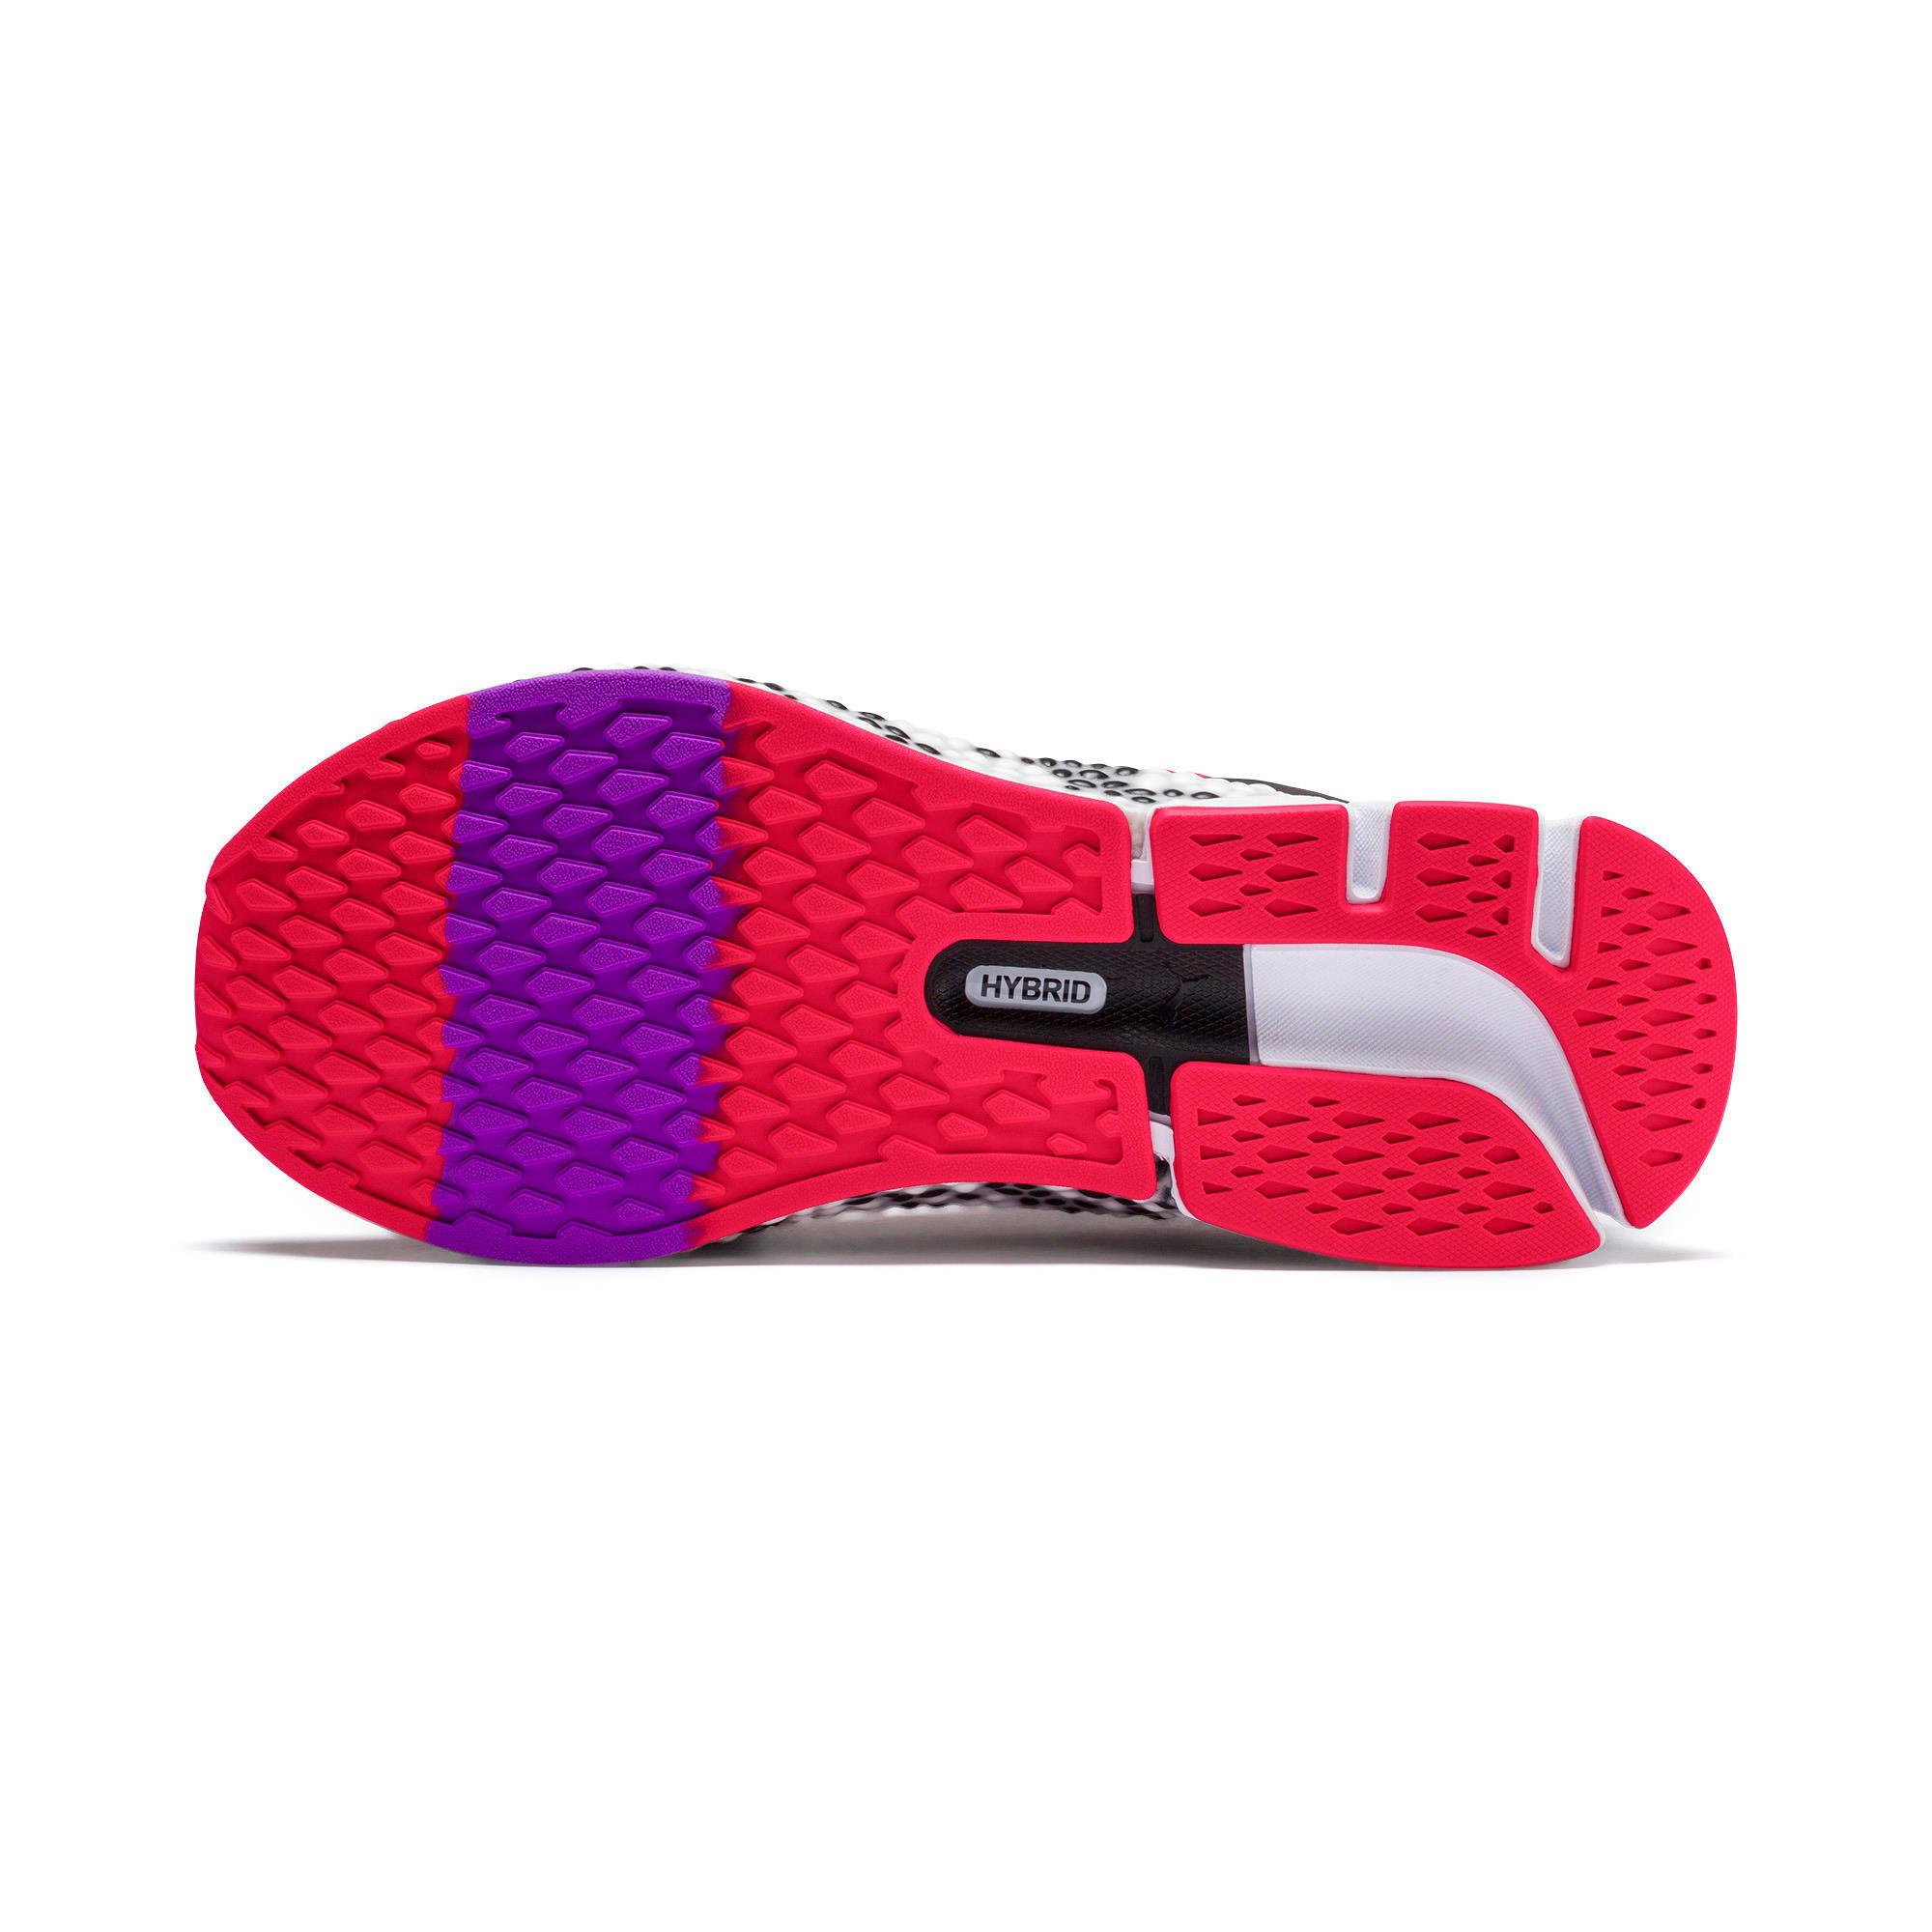 Thumbnail 5 of HYBRID NETFIT Astro Women's Running Shoes, Nrgy Rose-Puma Black, medium